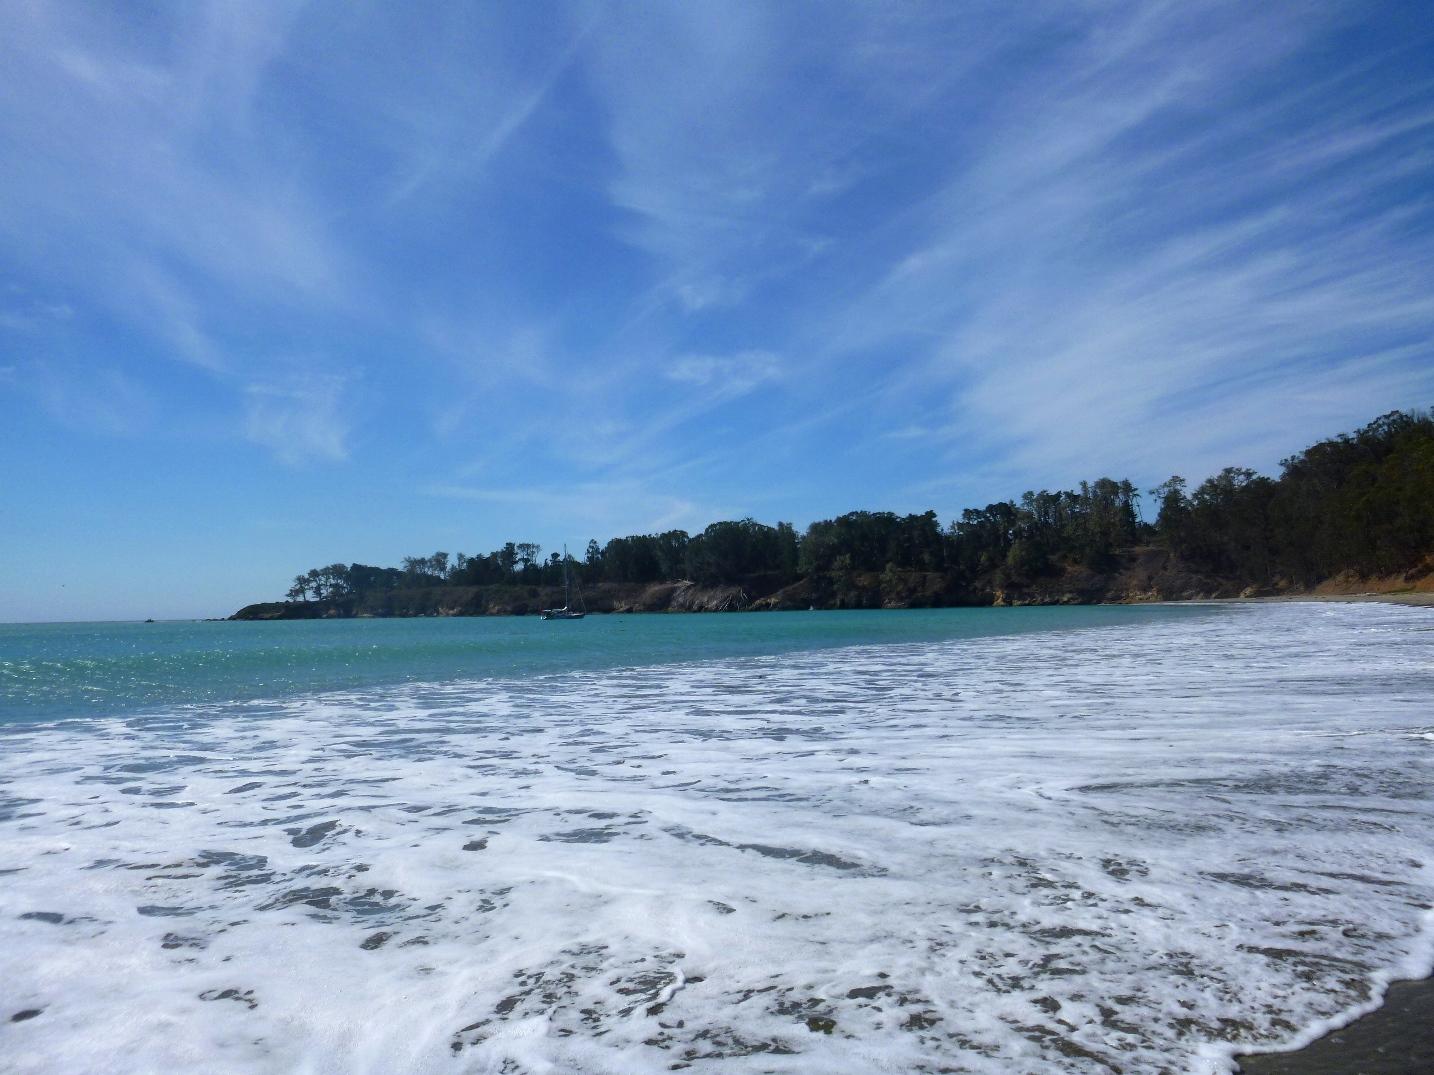 Down coast to san simeon carmanah sailing for San simion